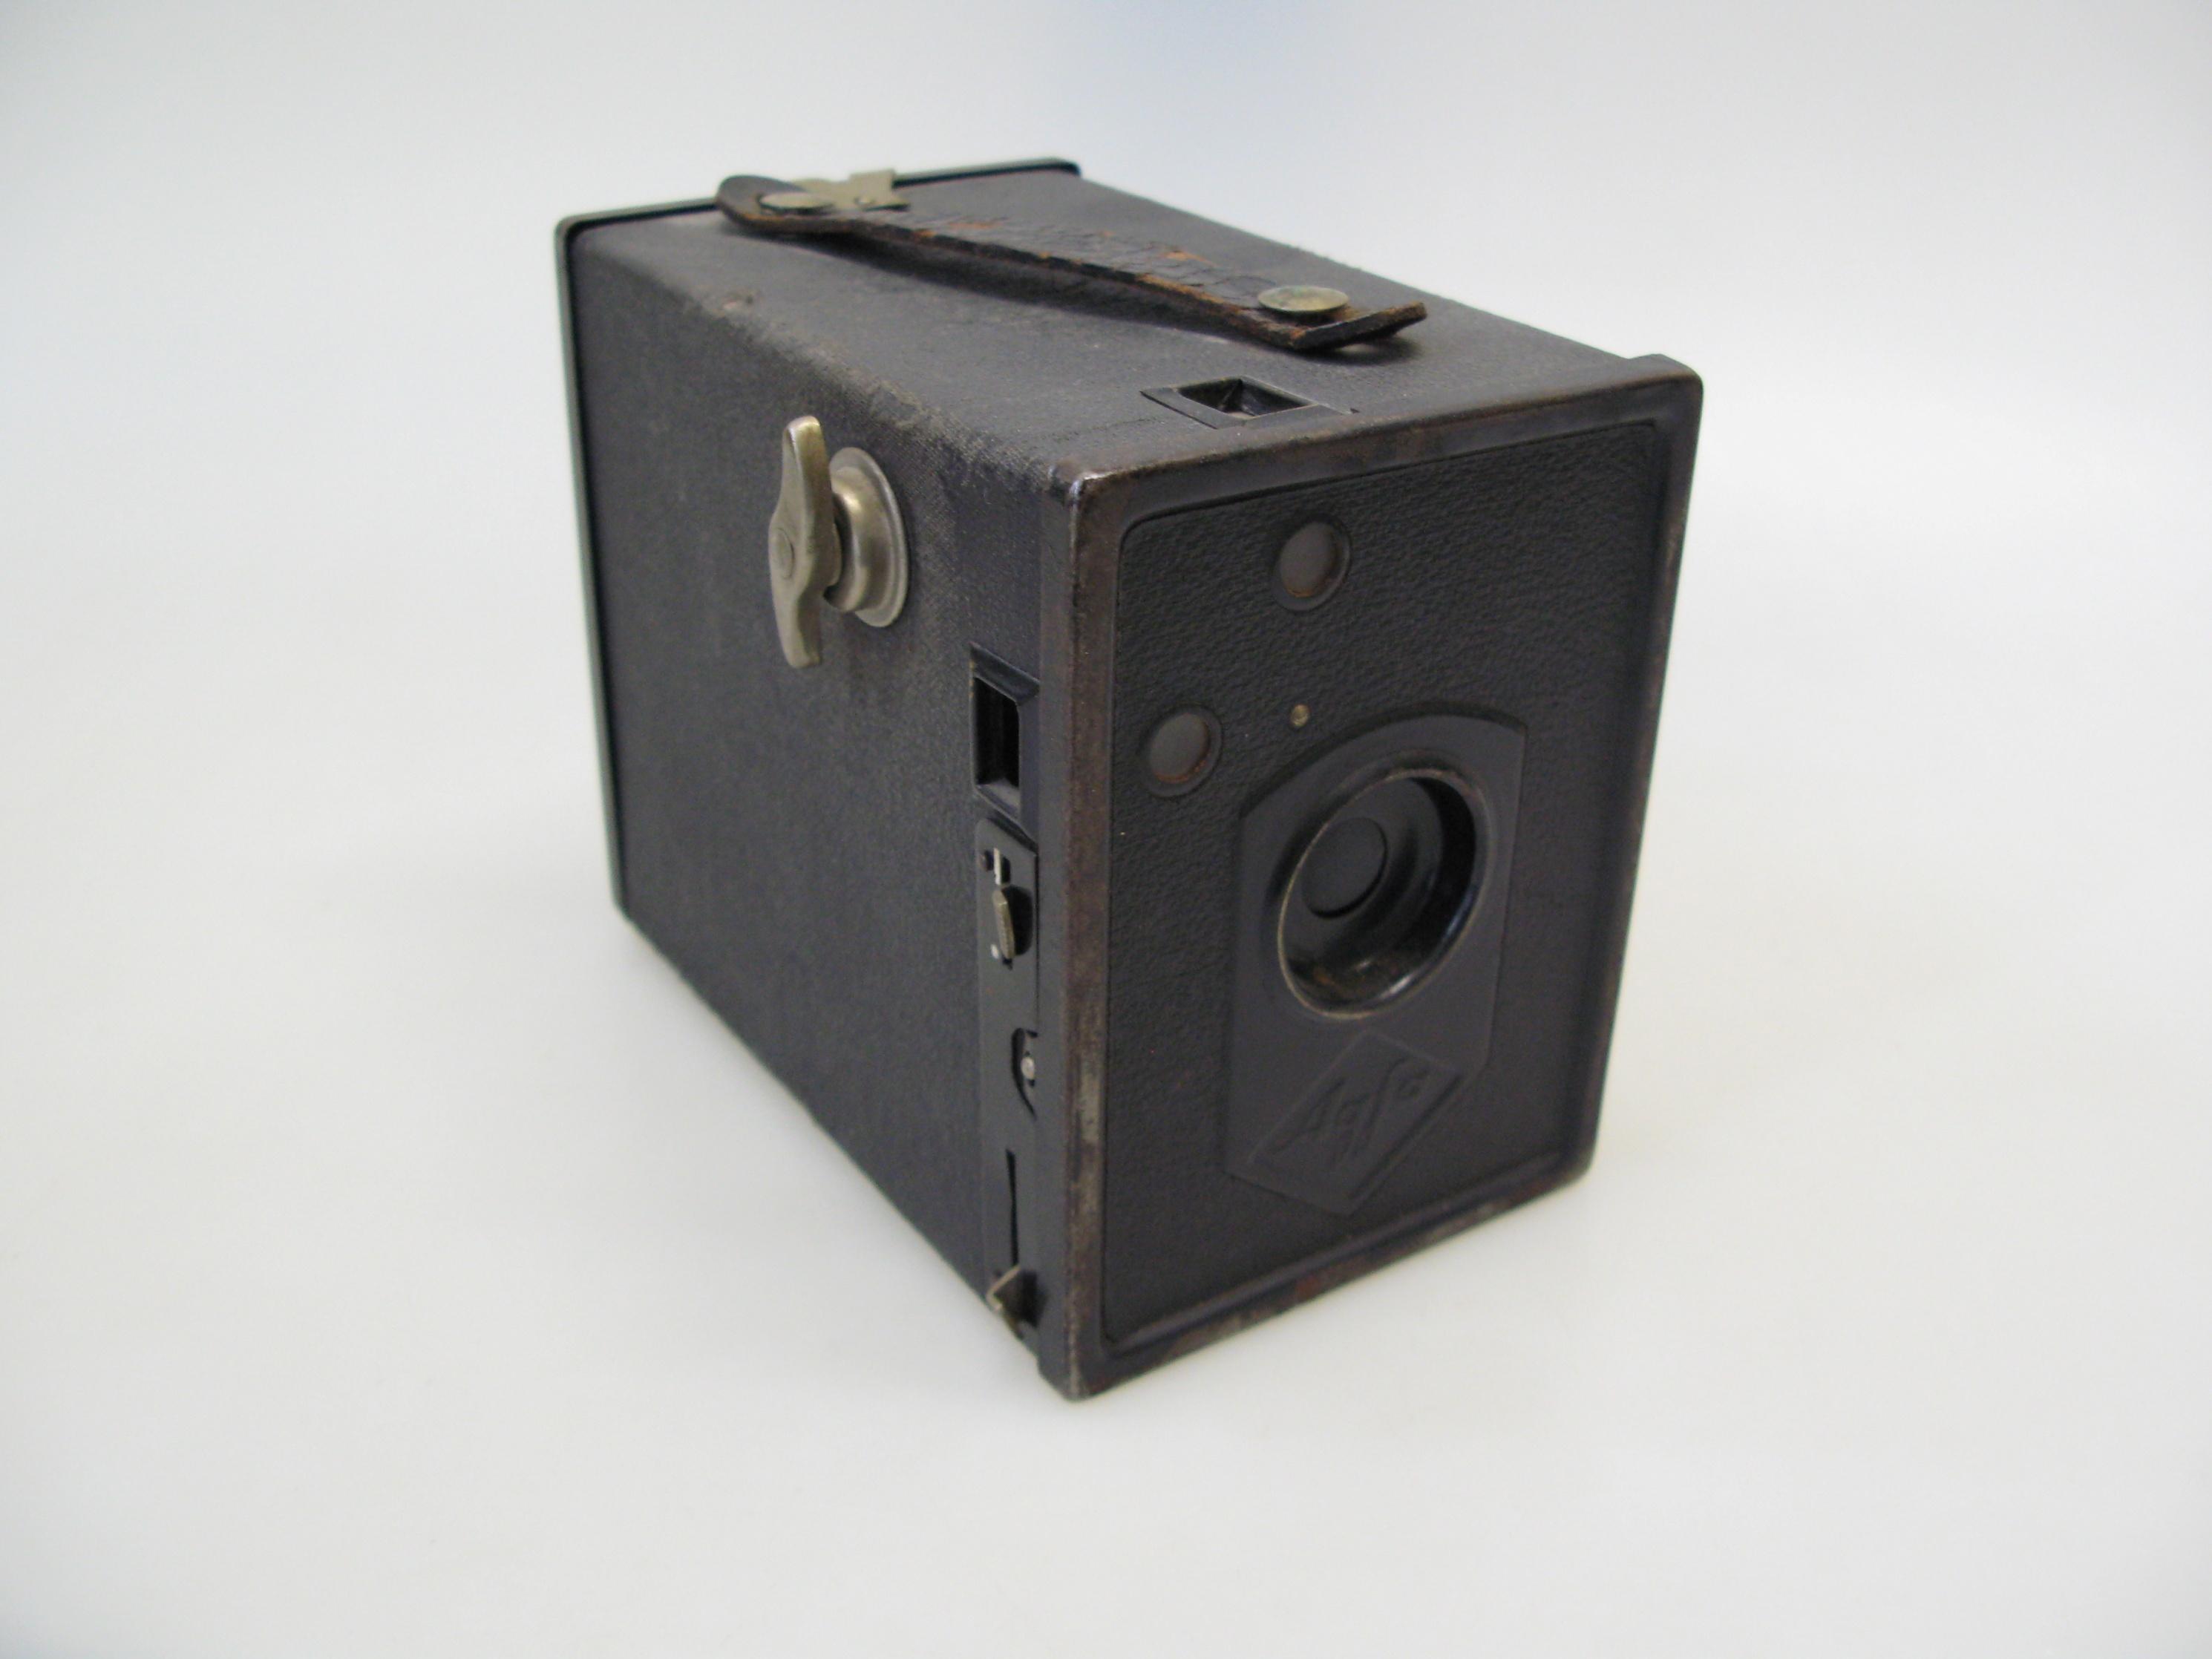 Kamera AGFA-Box 44